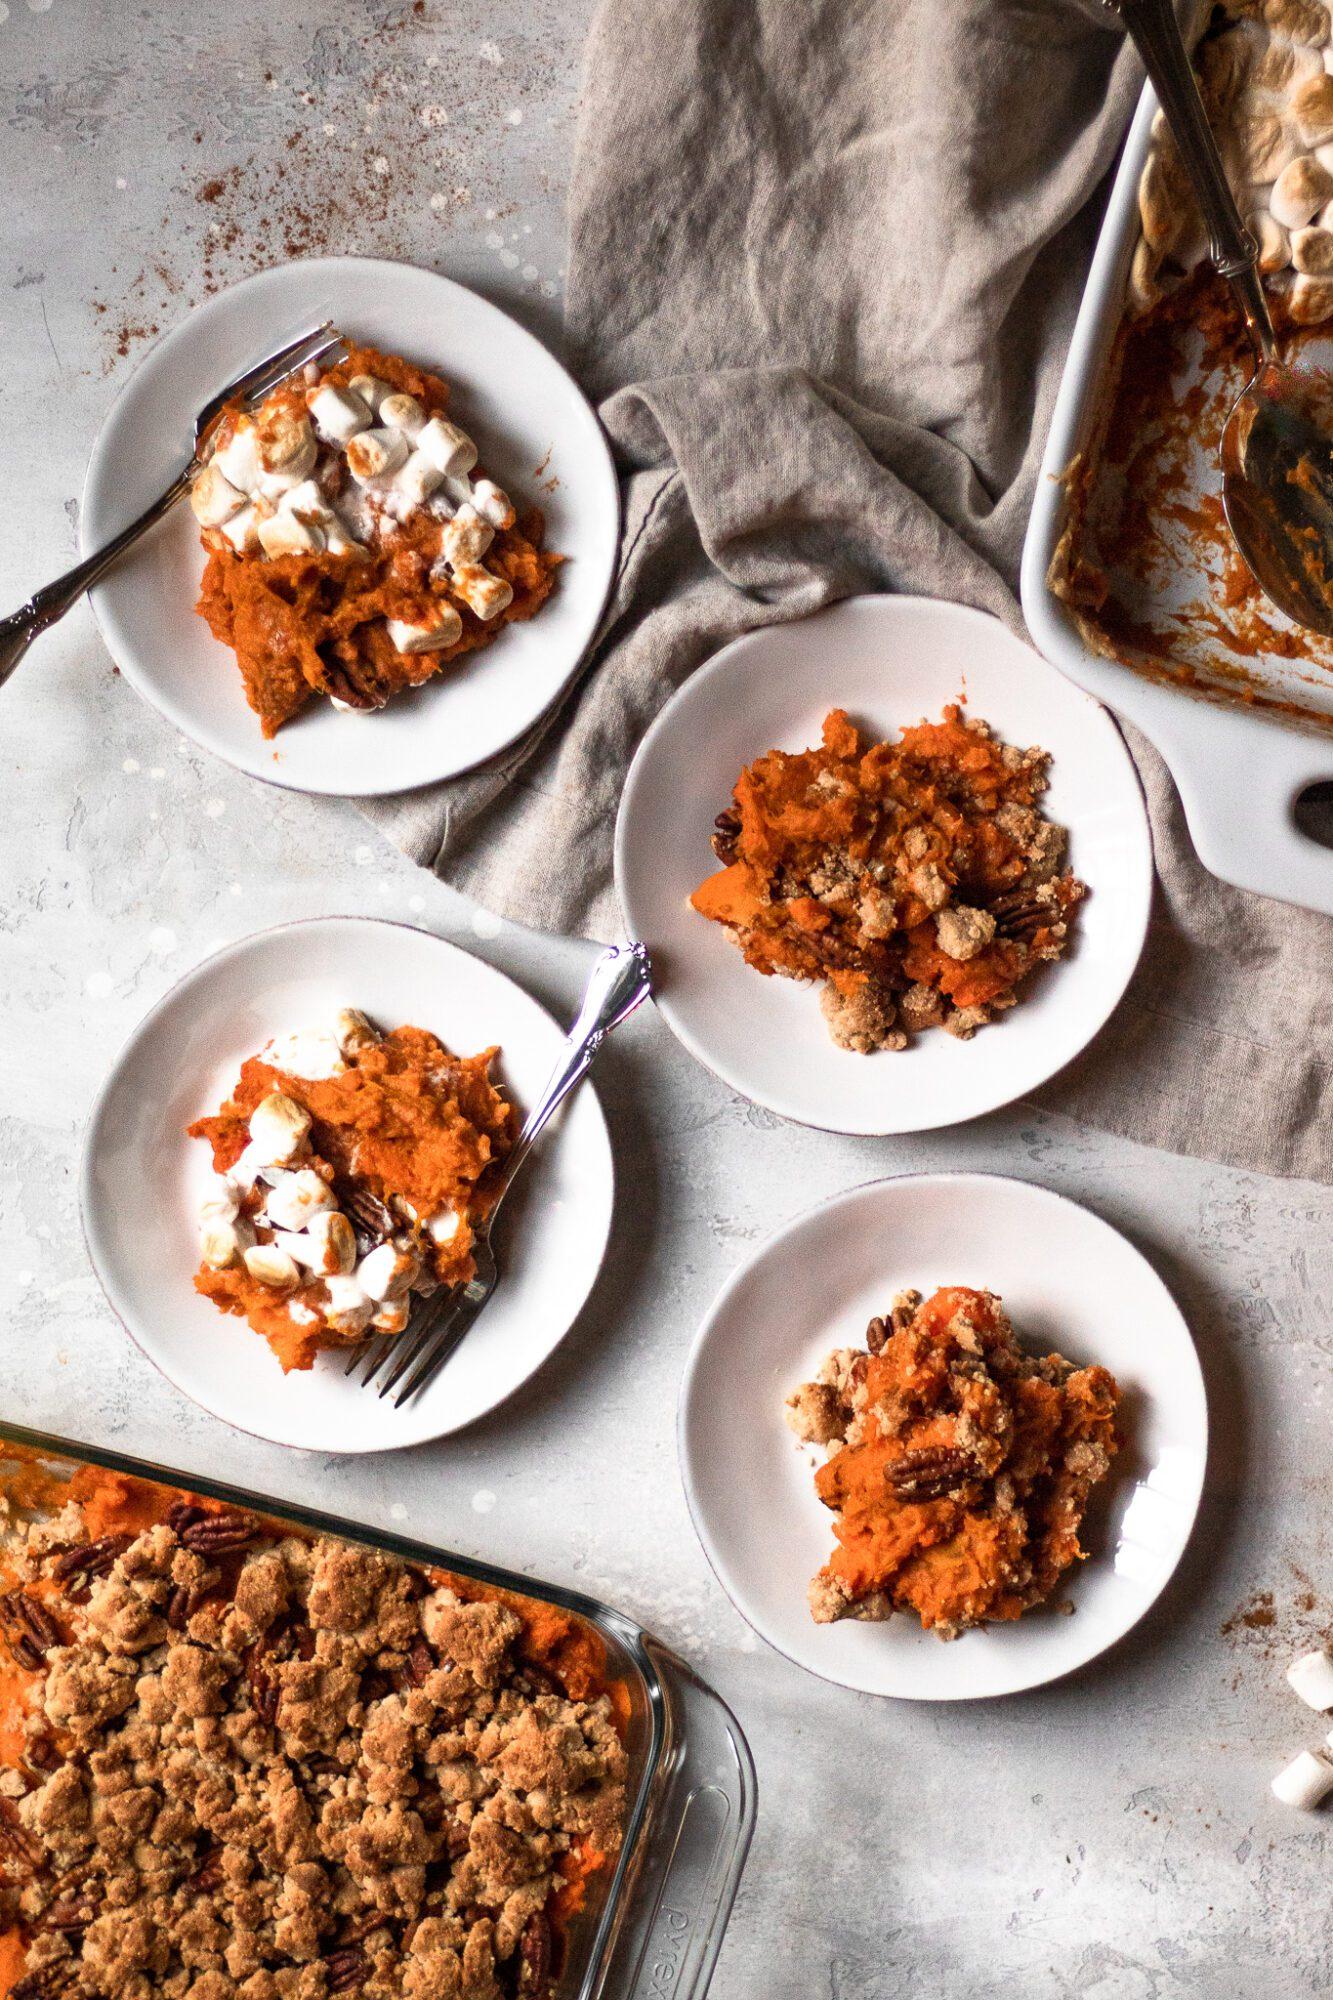 sweet potato casserole on plates